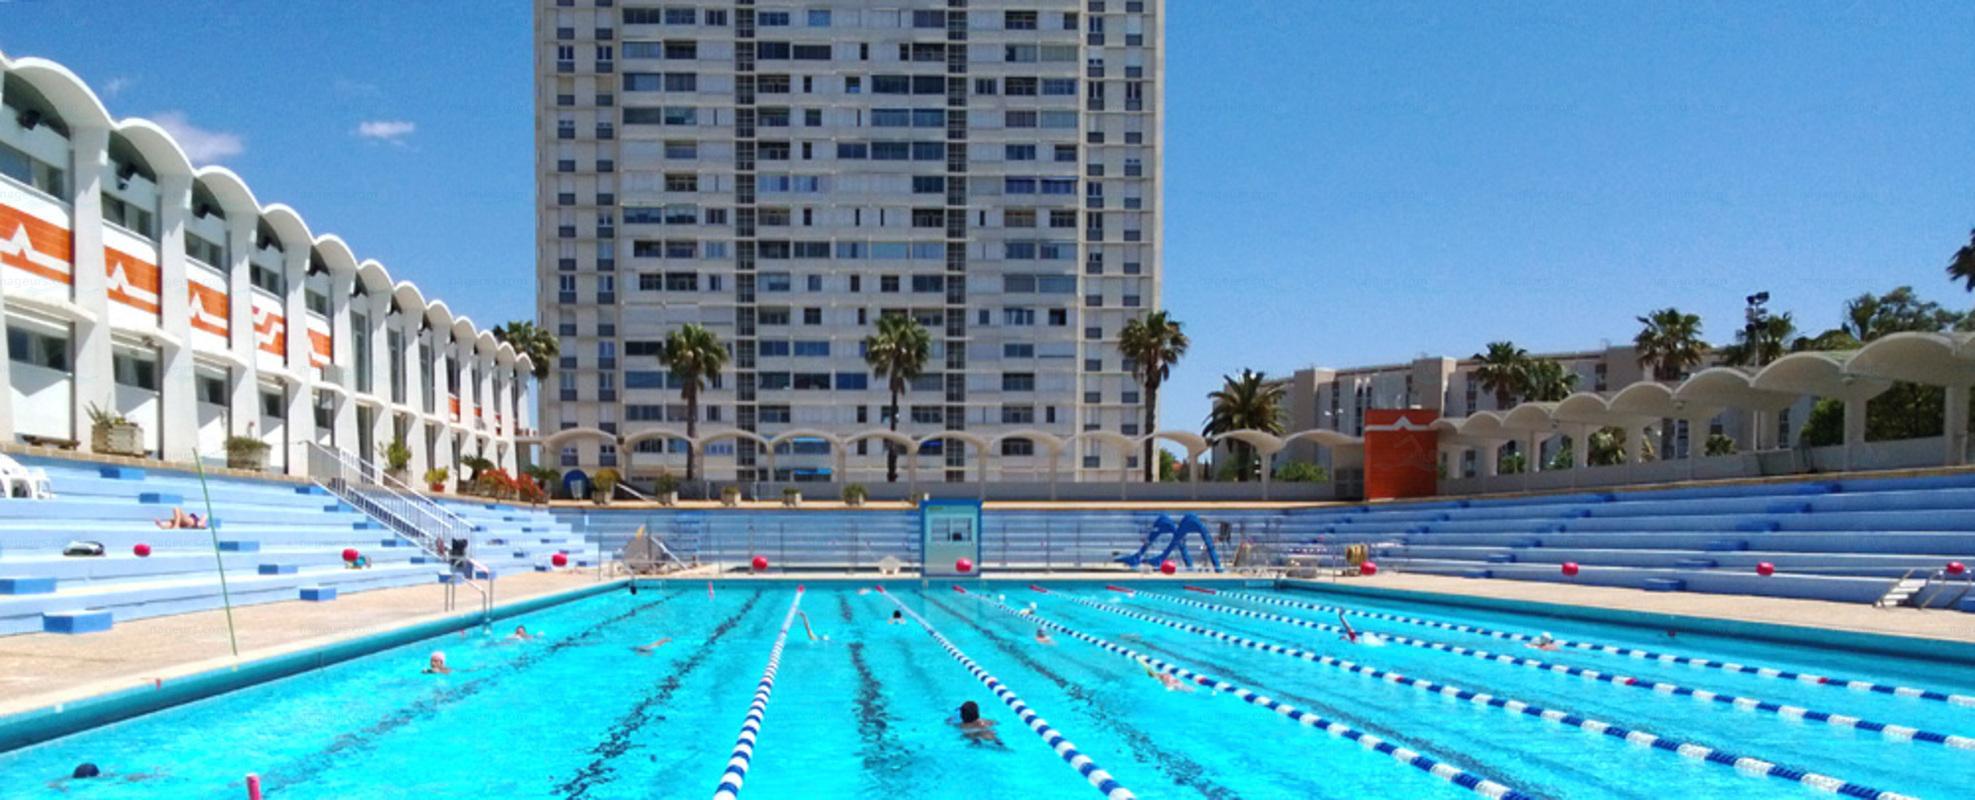 Photos piscine port marchand - Horaires piscine toulon port marchand ...